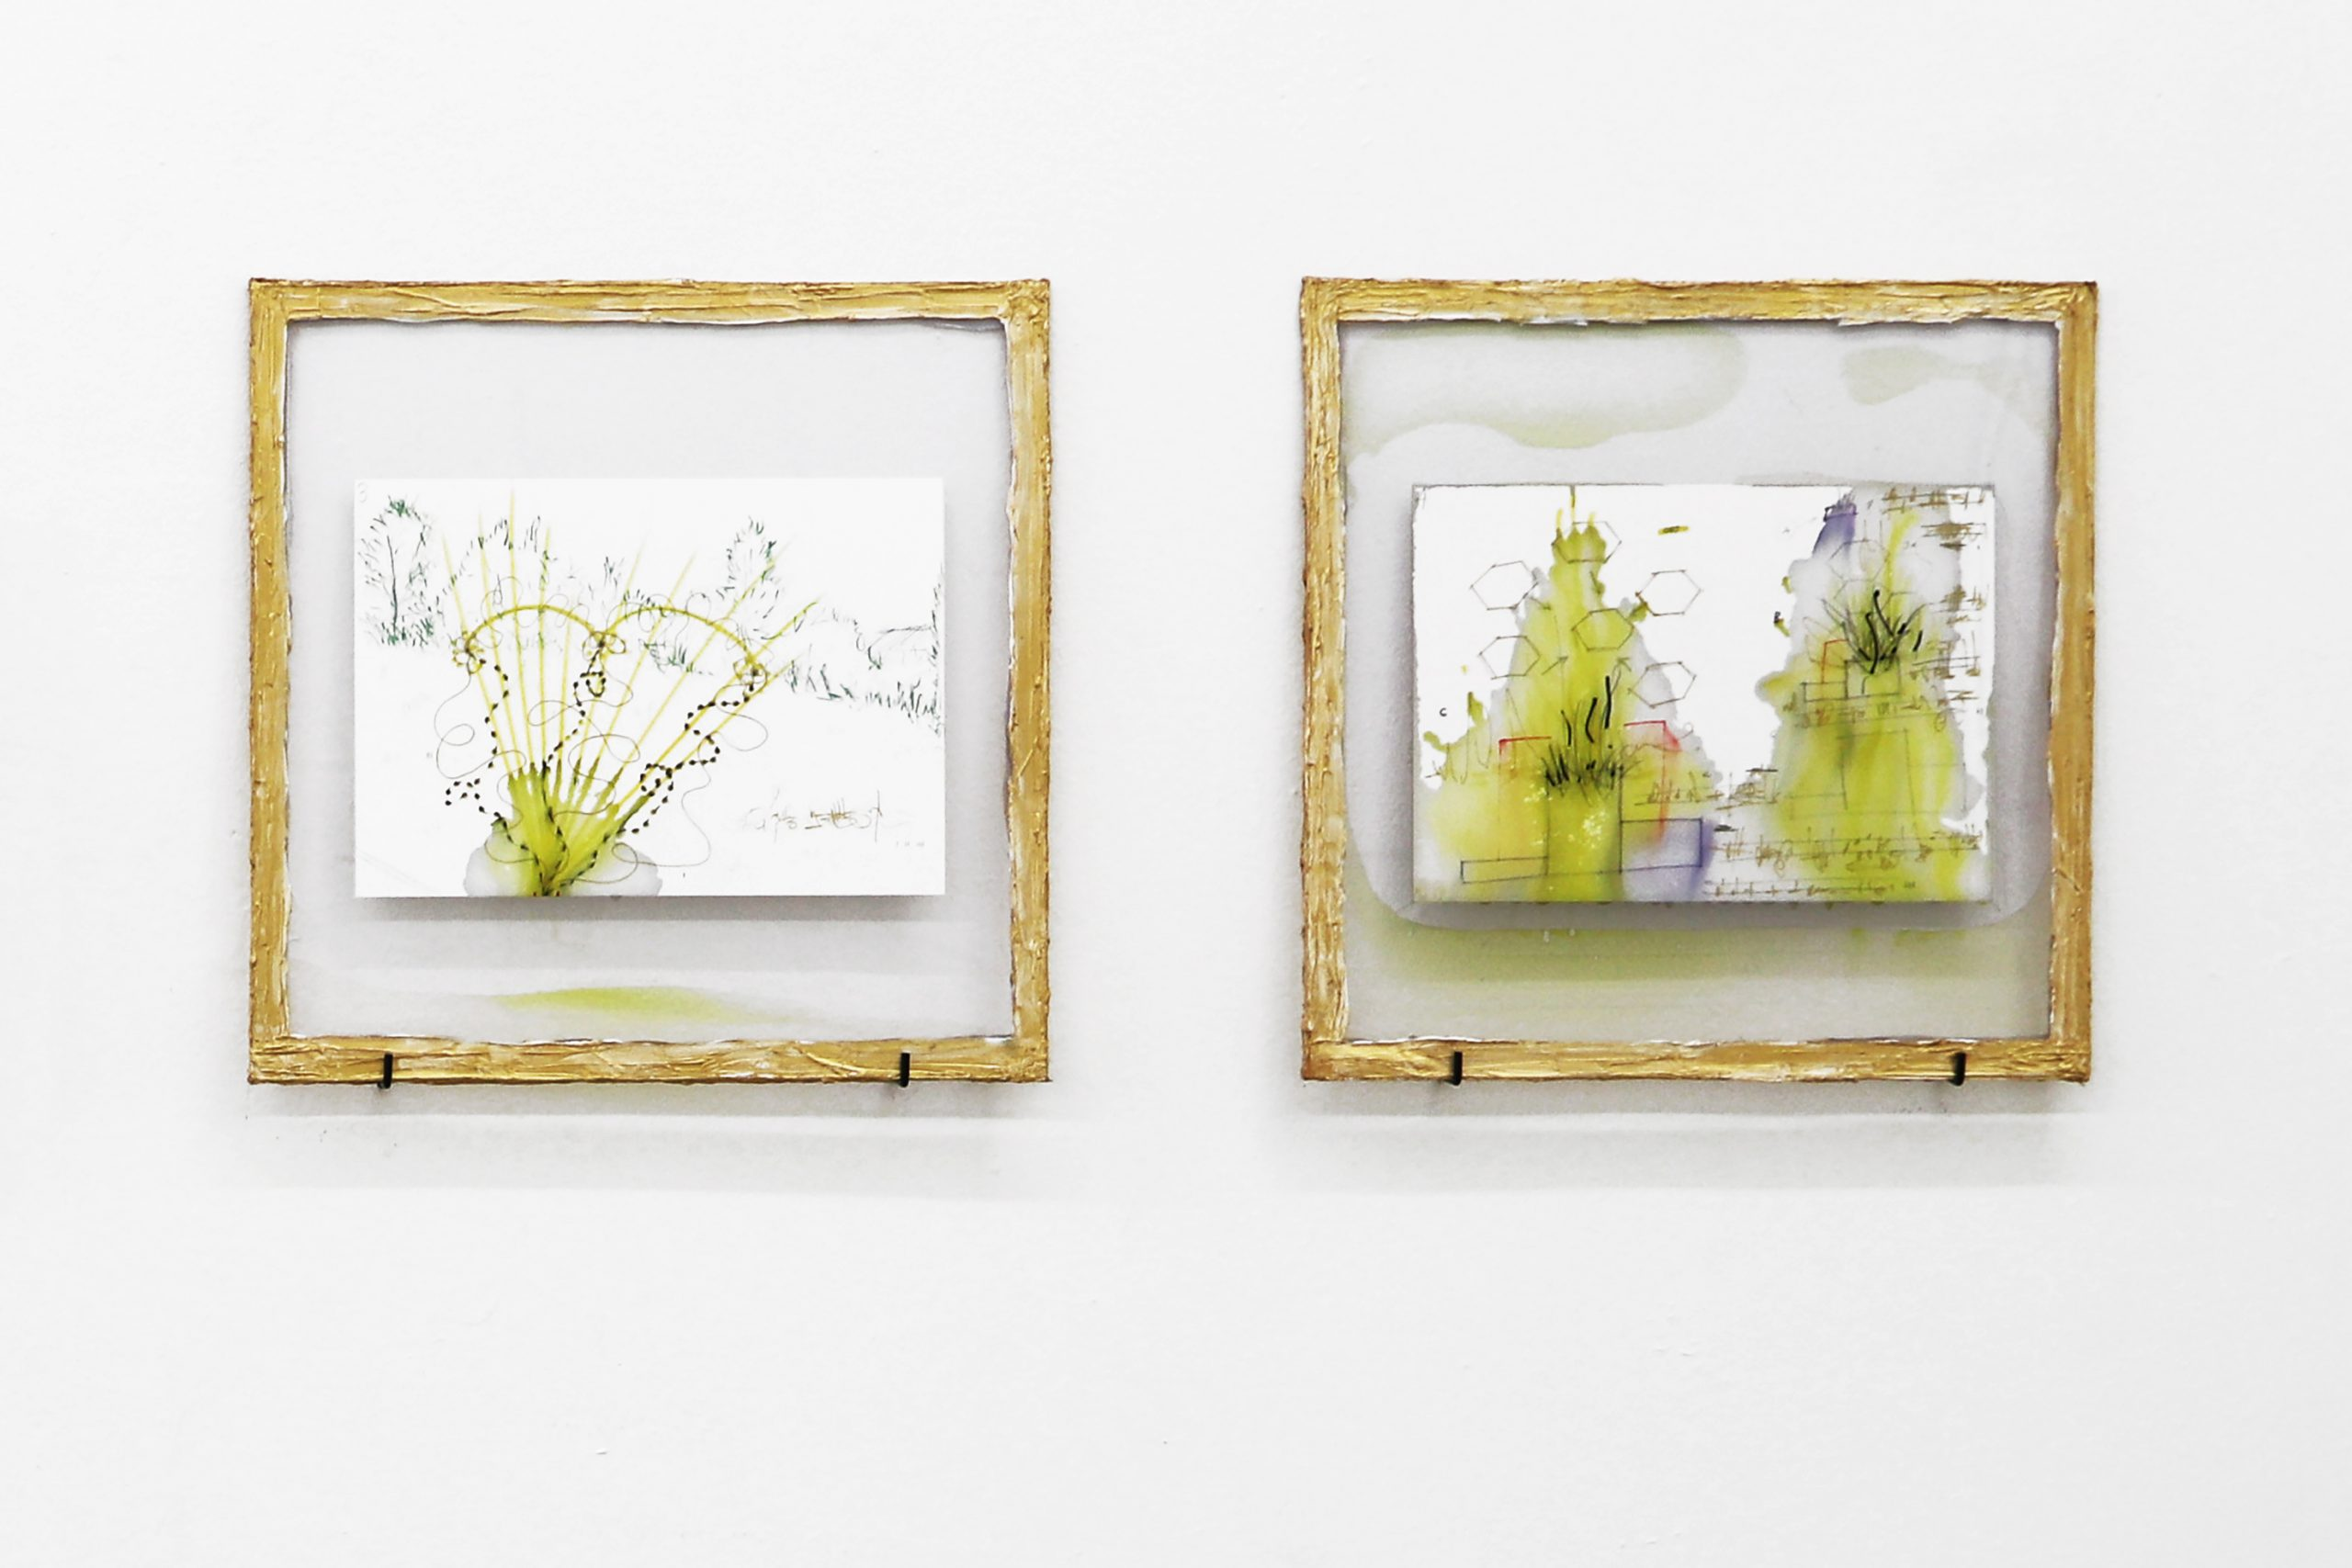 C0039_Performance drawings 3-4_Luca Bosani x